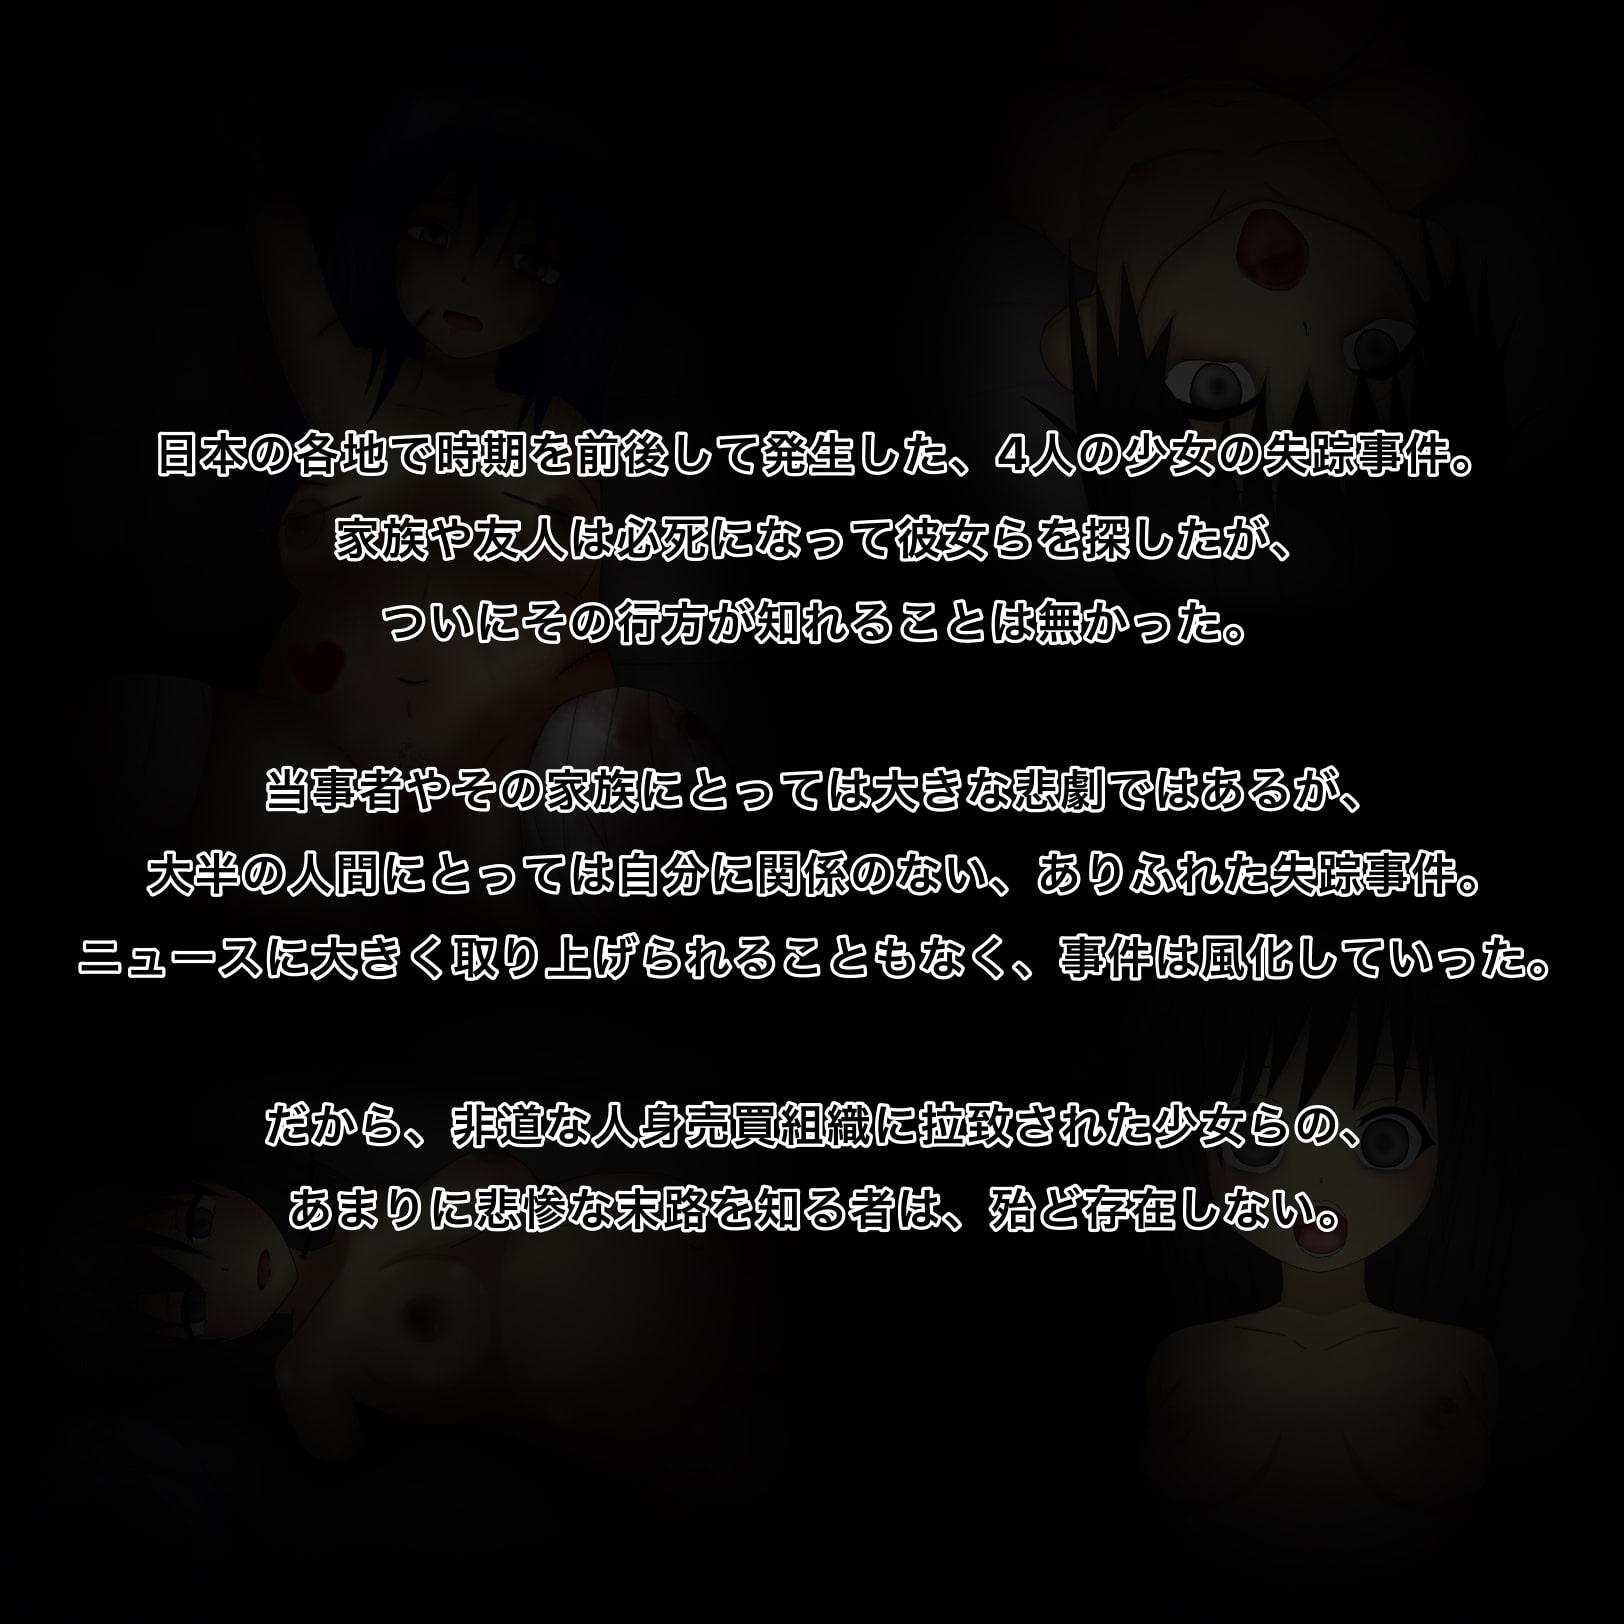 R18G CG集 醒めない悪夢